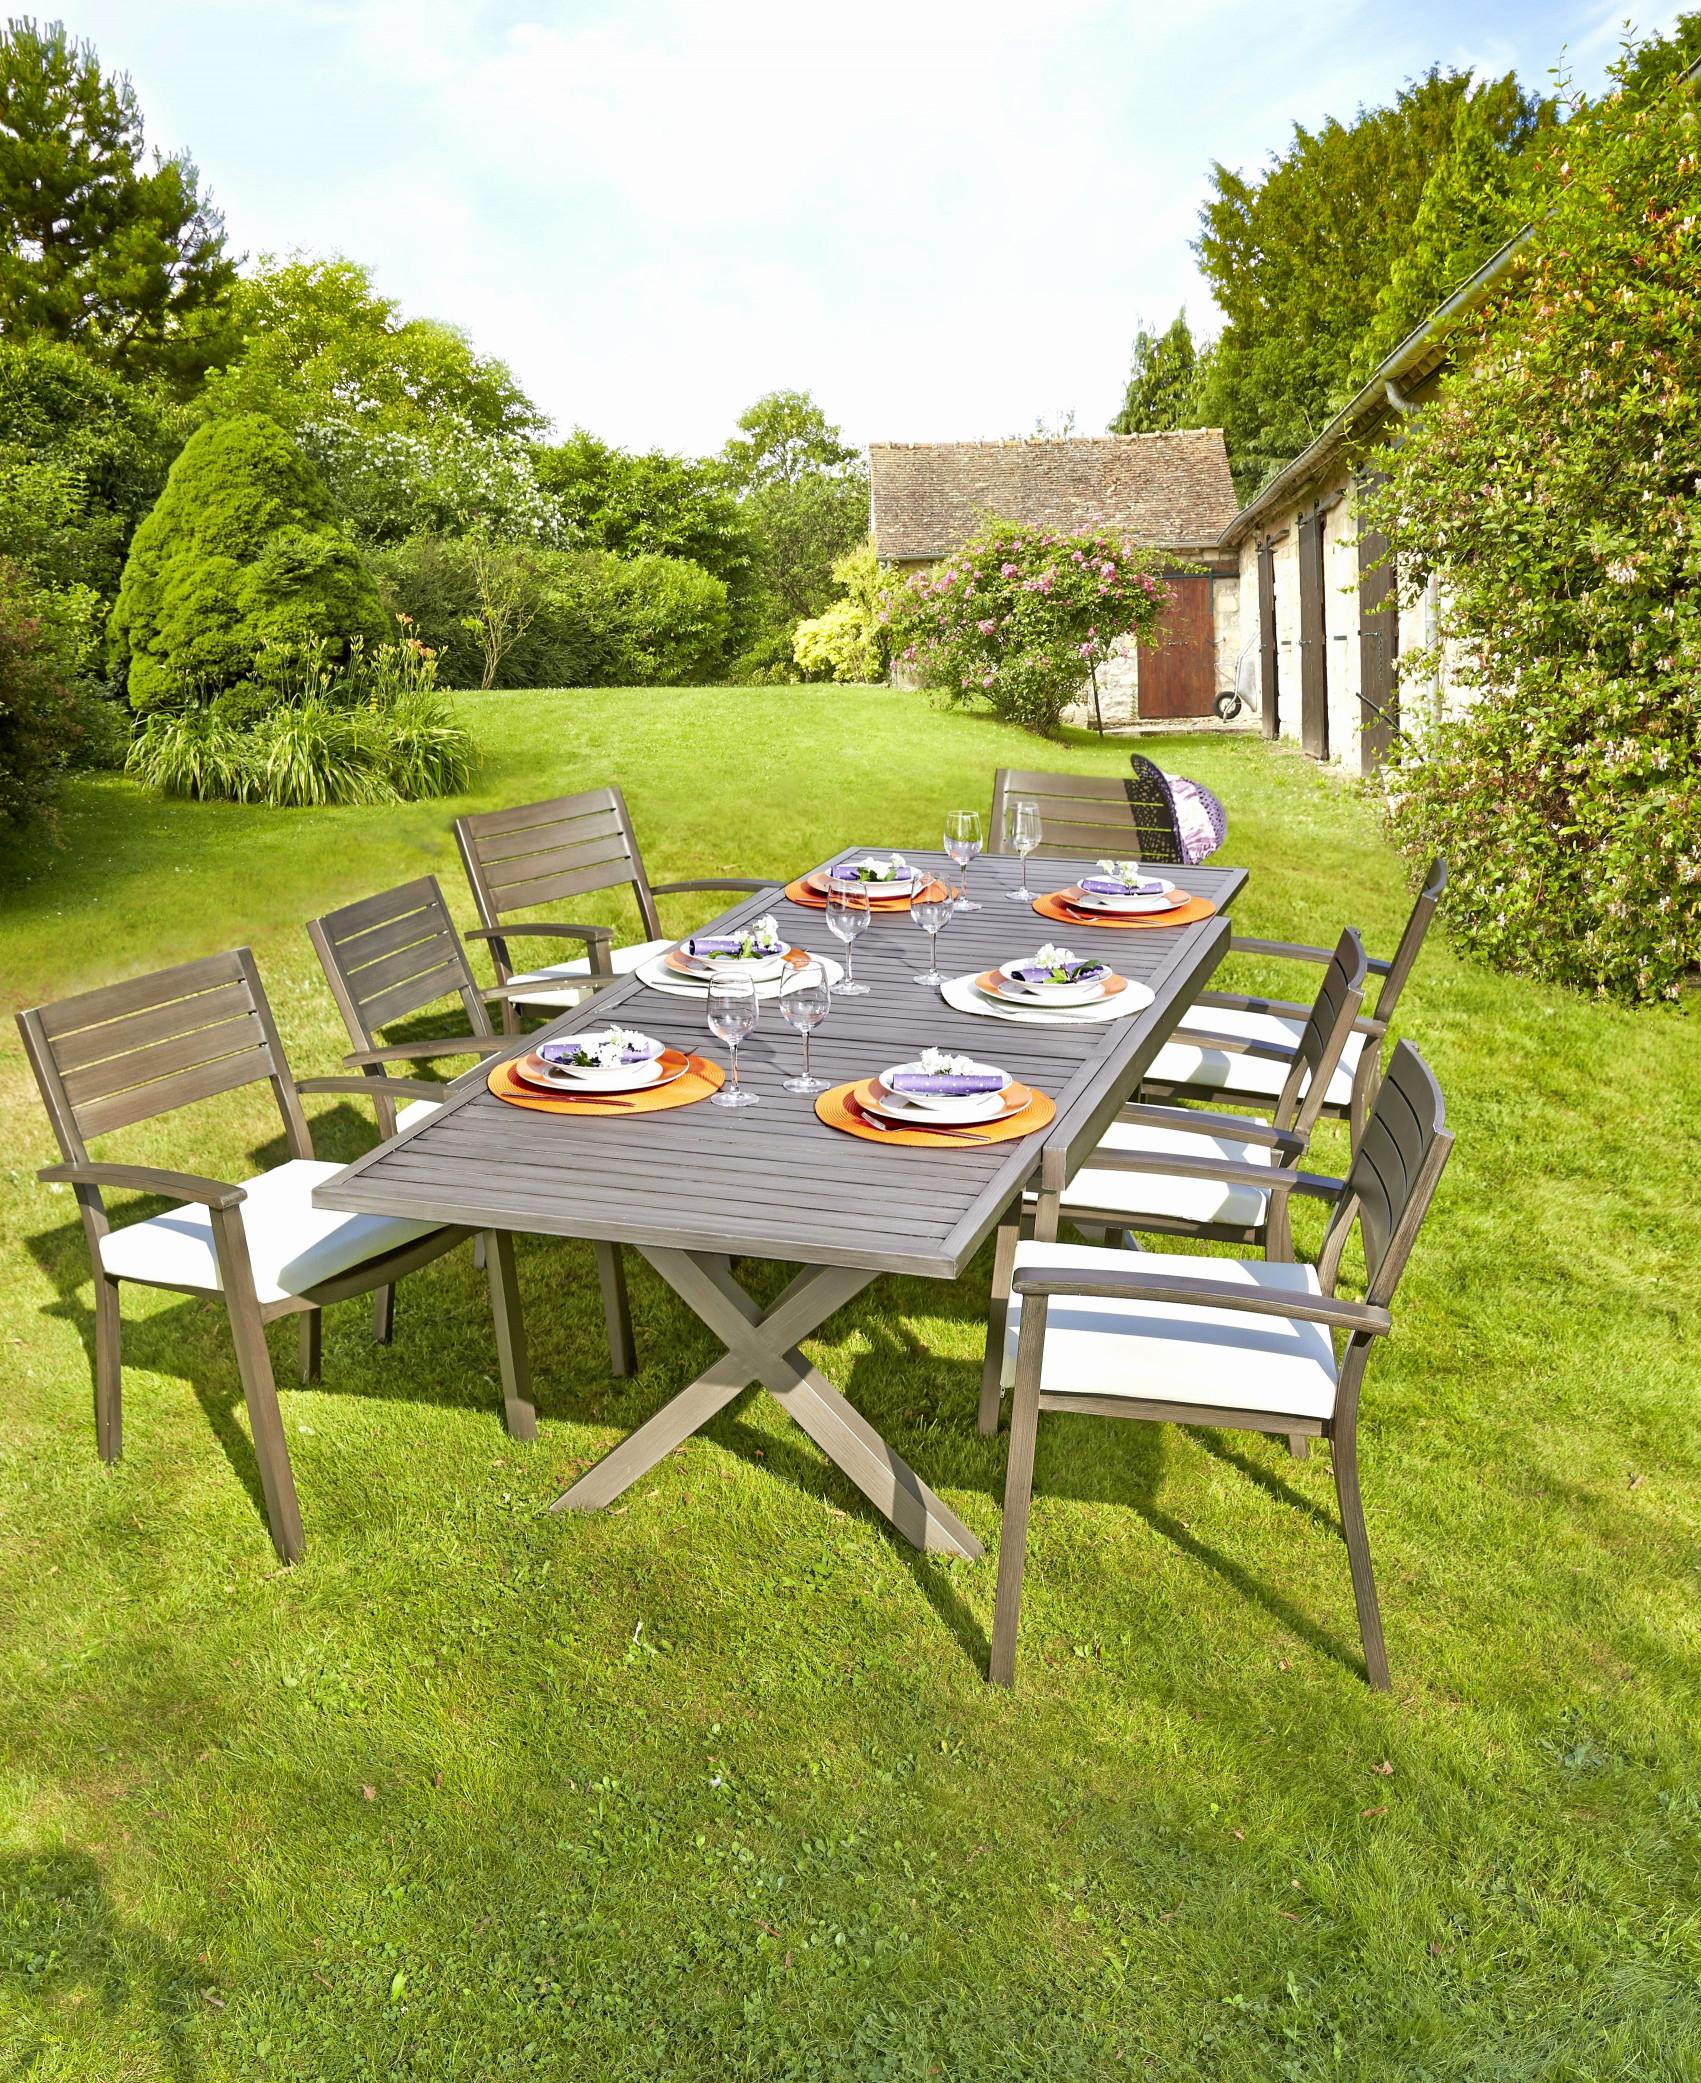 Alinea Fauteuil Jardin Inspirant Photos Table Et Chaise Jardin Superbe Table Extensible Table Extensible